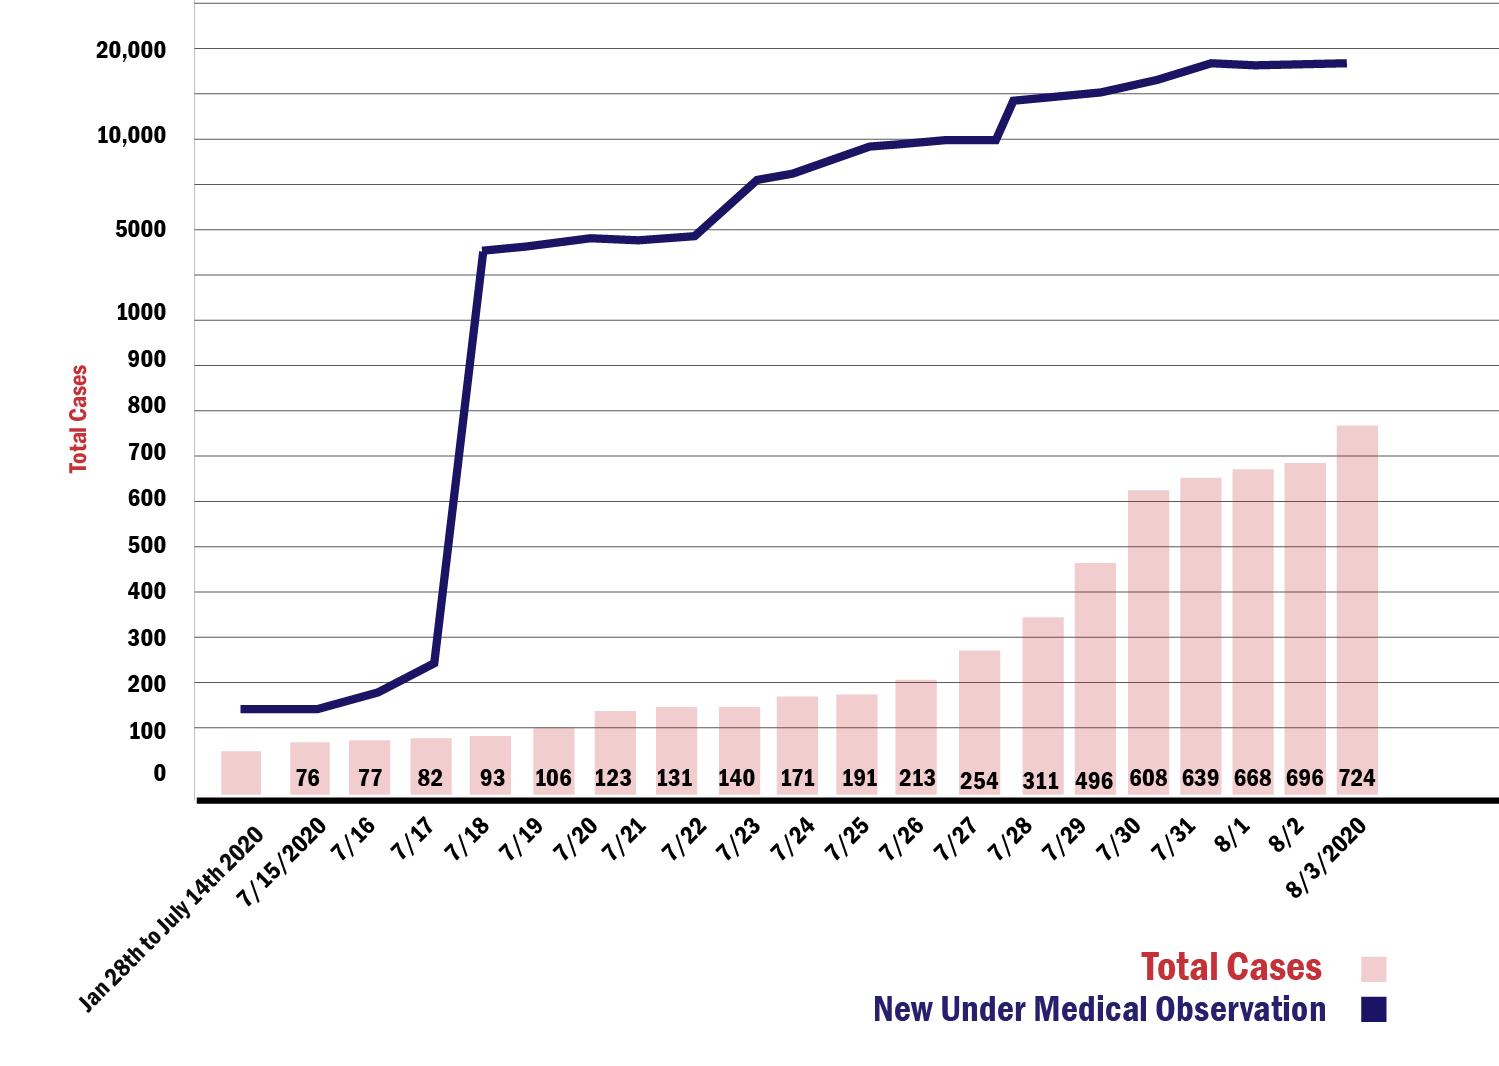 Coronavirus cases in the Xinjiang Uyghur Autonomous Region through Aug. 3, 2020.